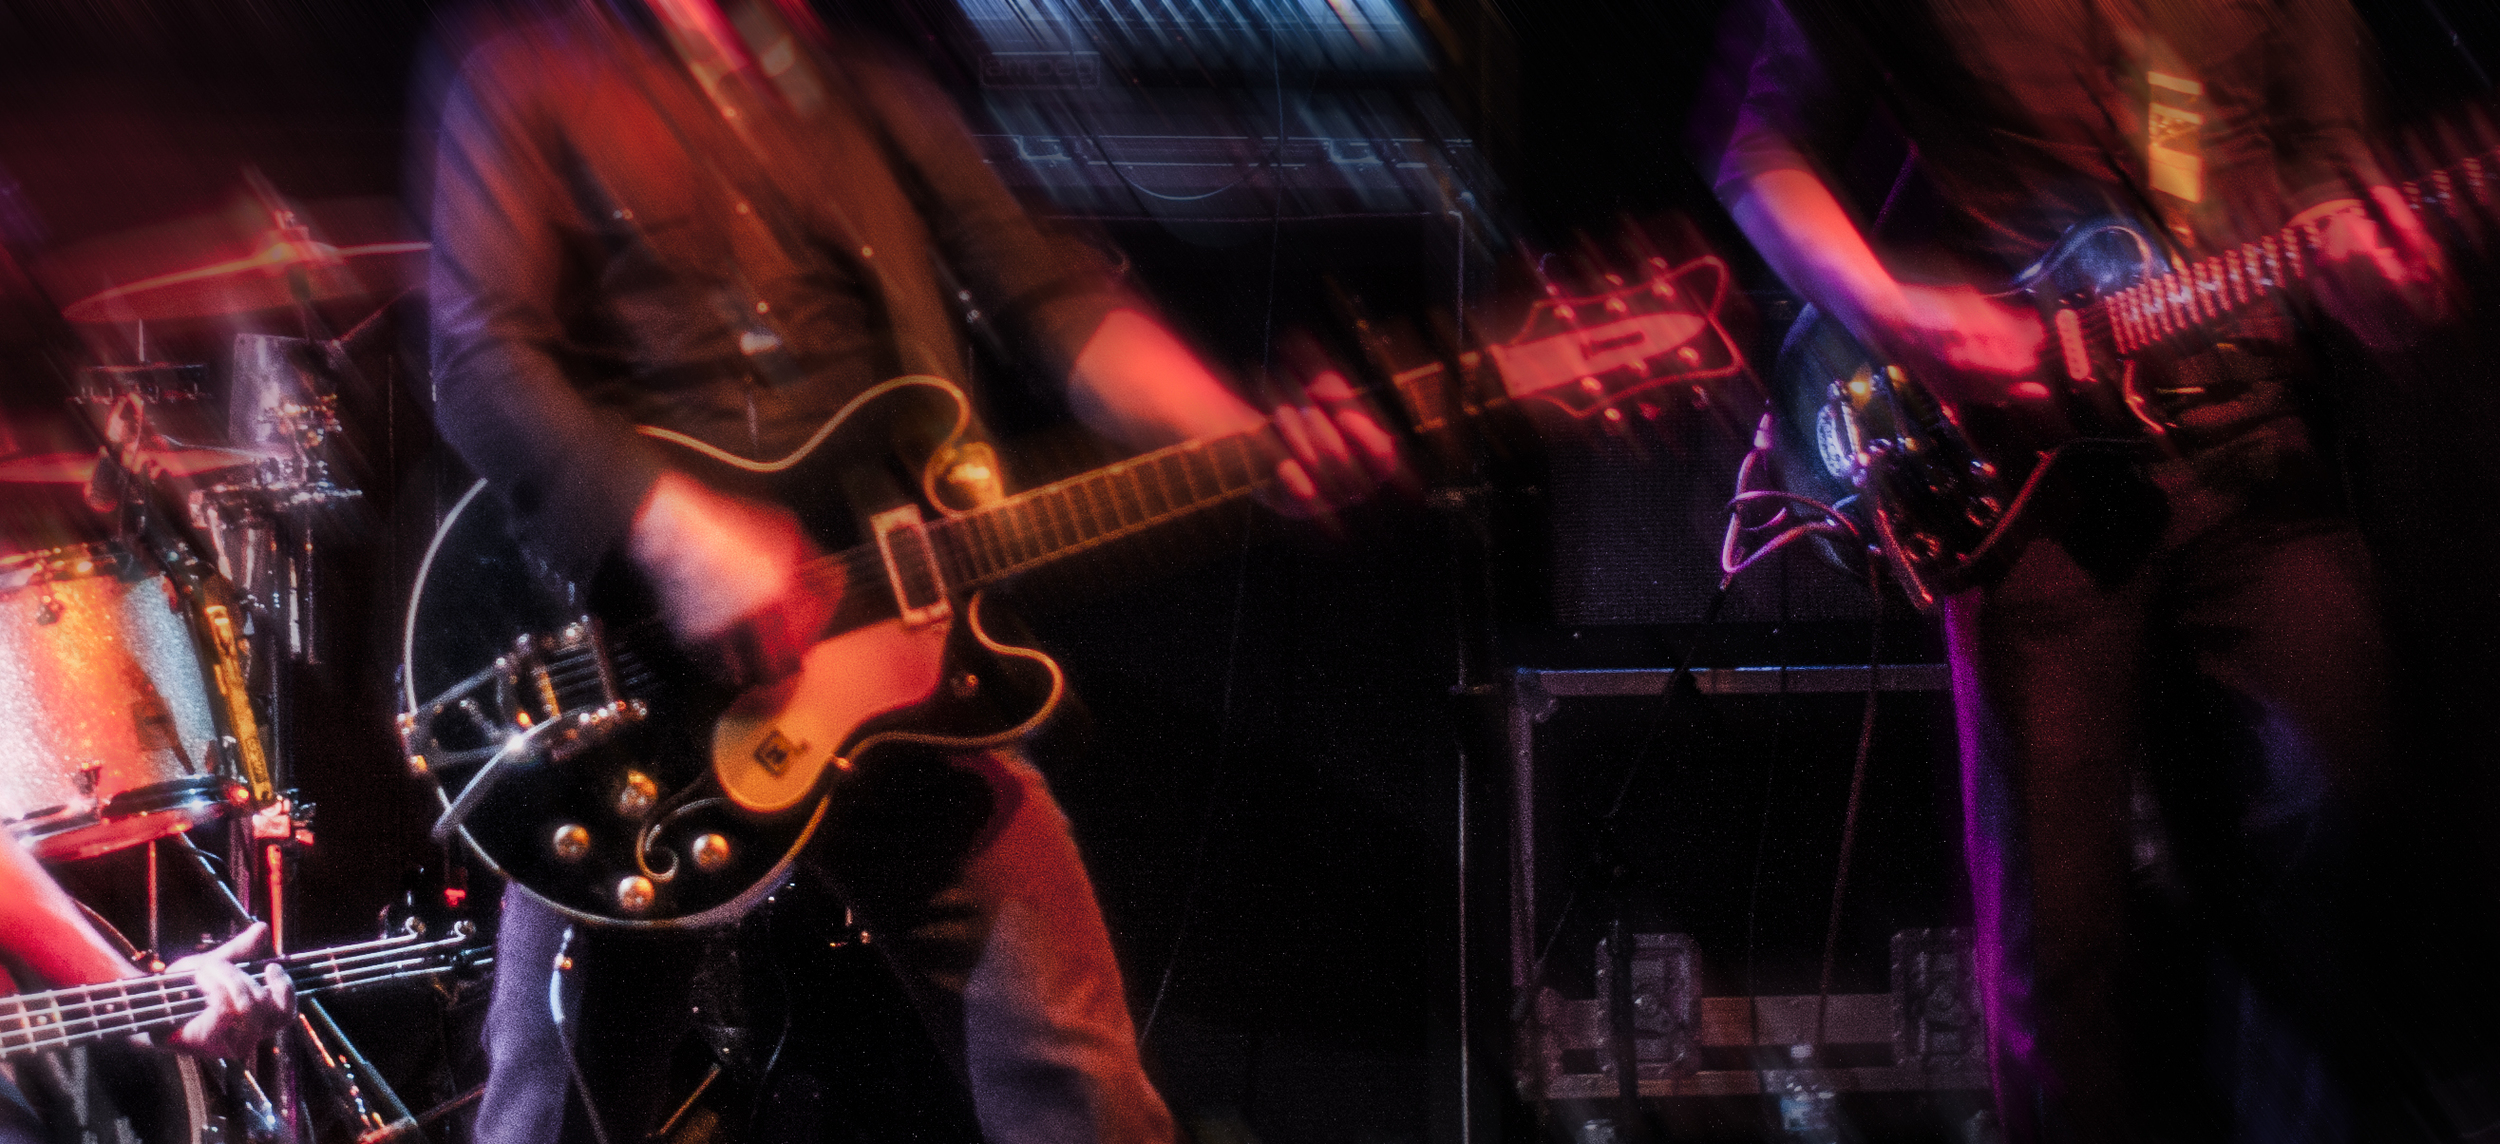 Mike_Guitars.jpg